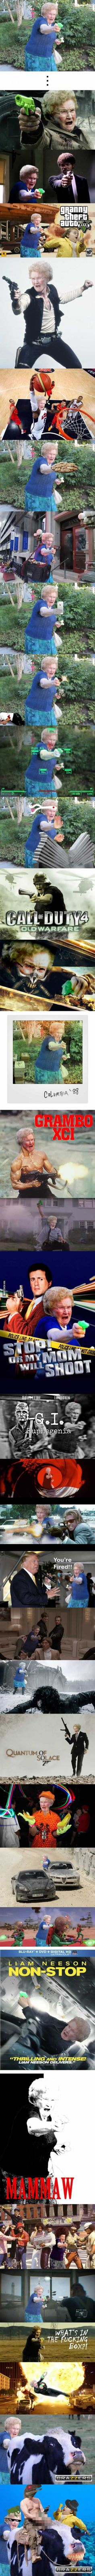 Omg Grandma with a gun